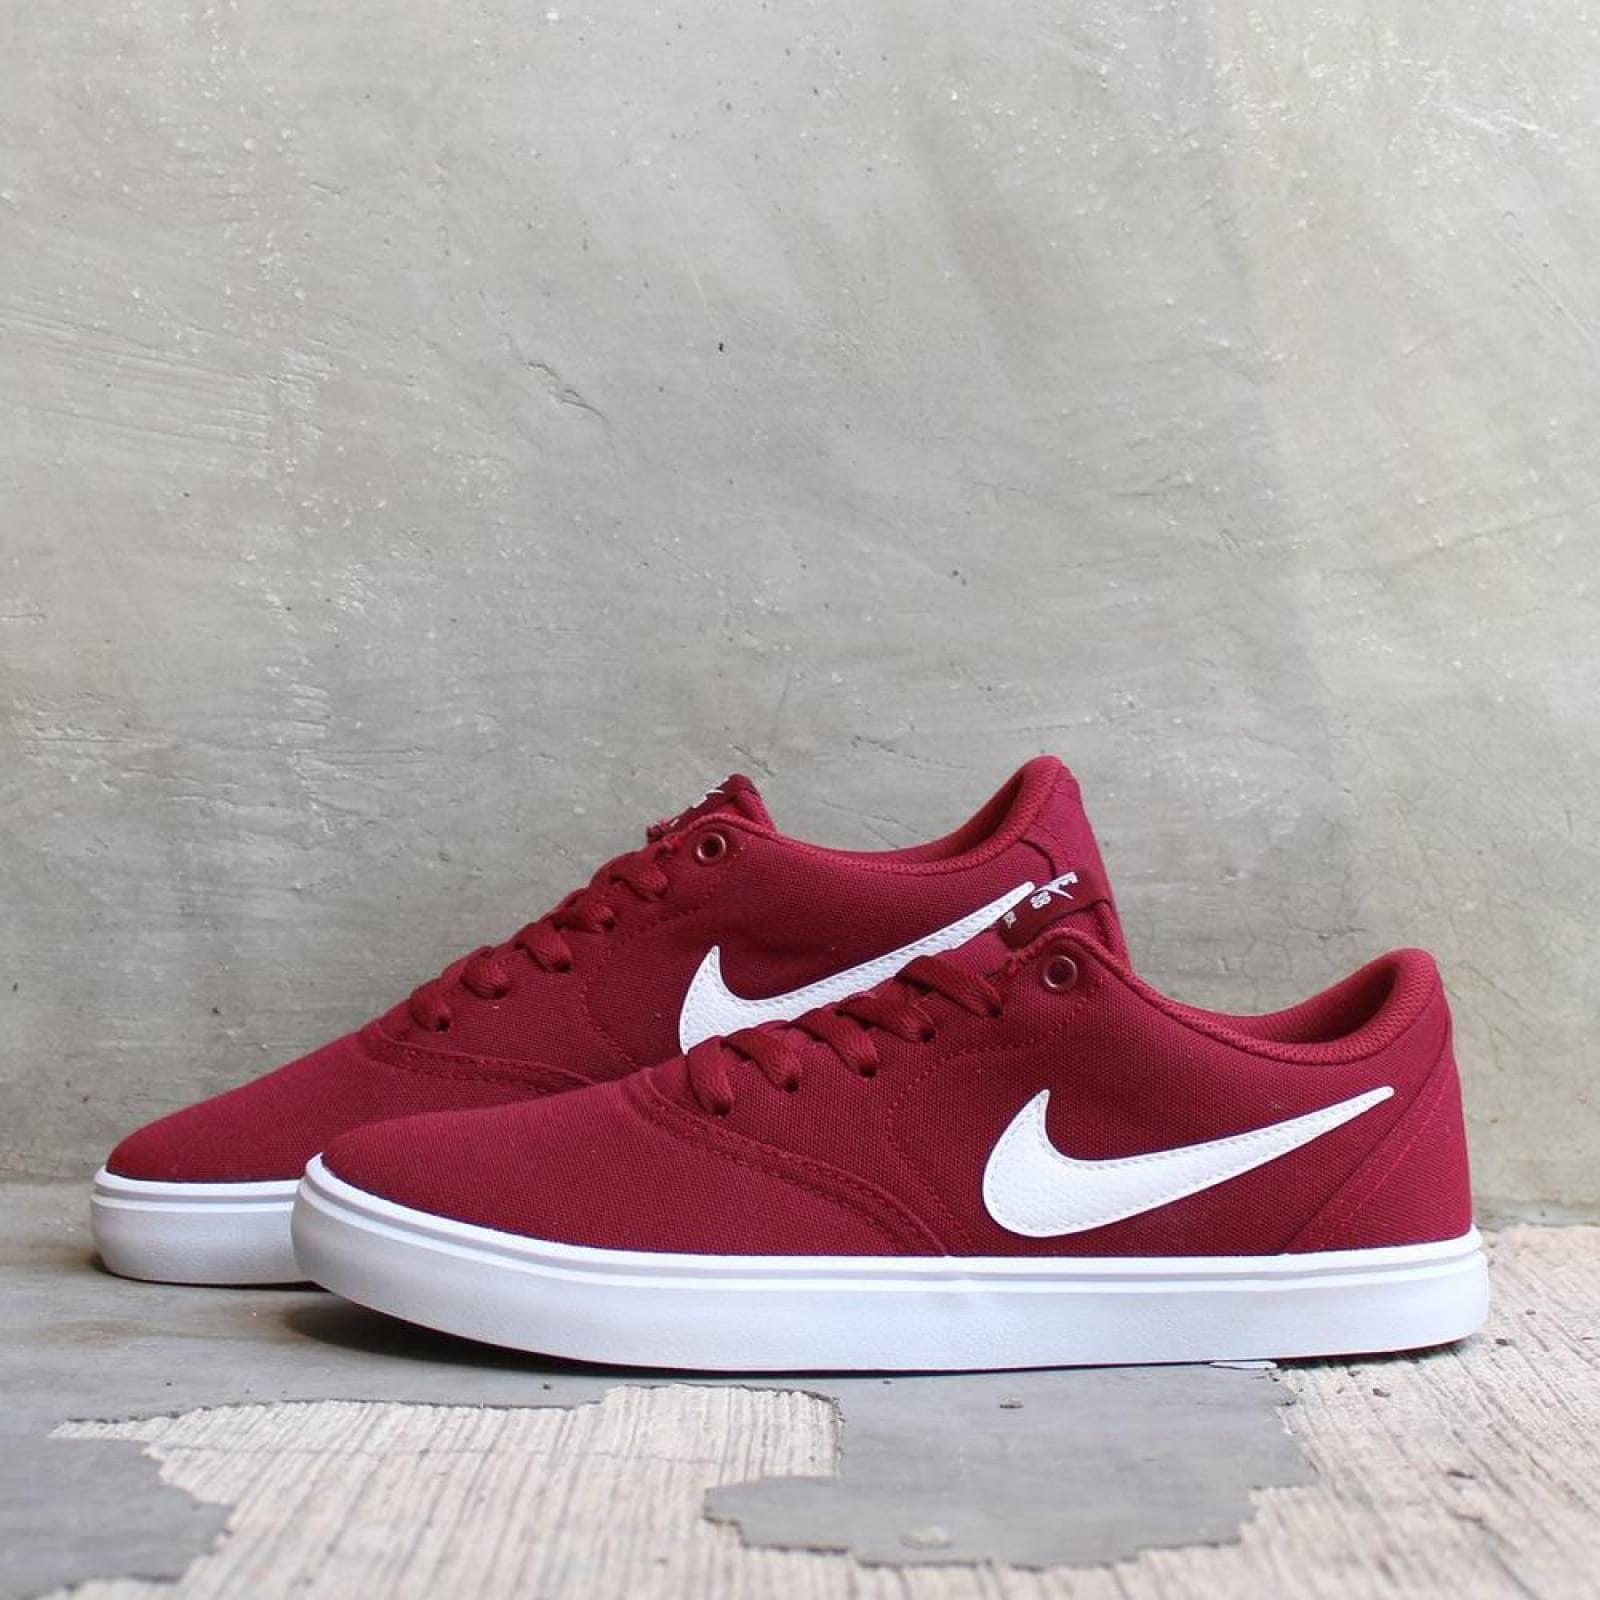 Tenis Nike SB Check Solar 843896602 Rojo Hombre